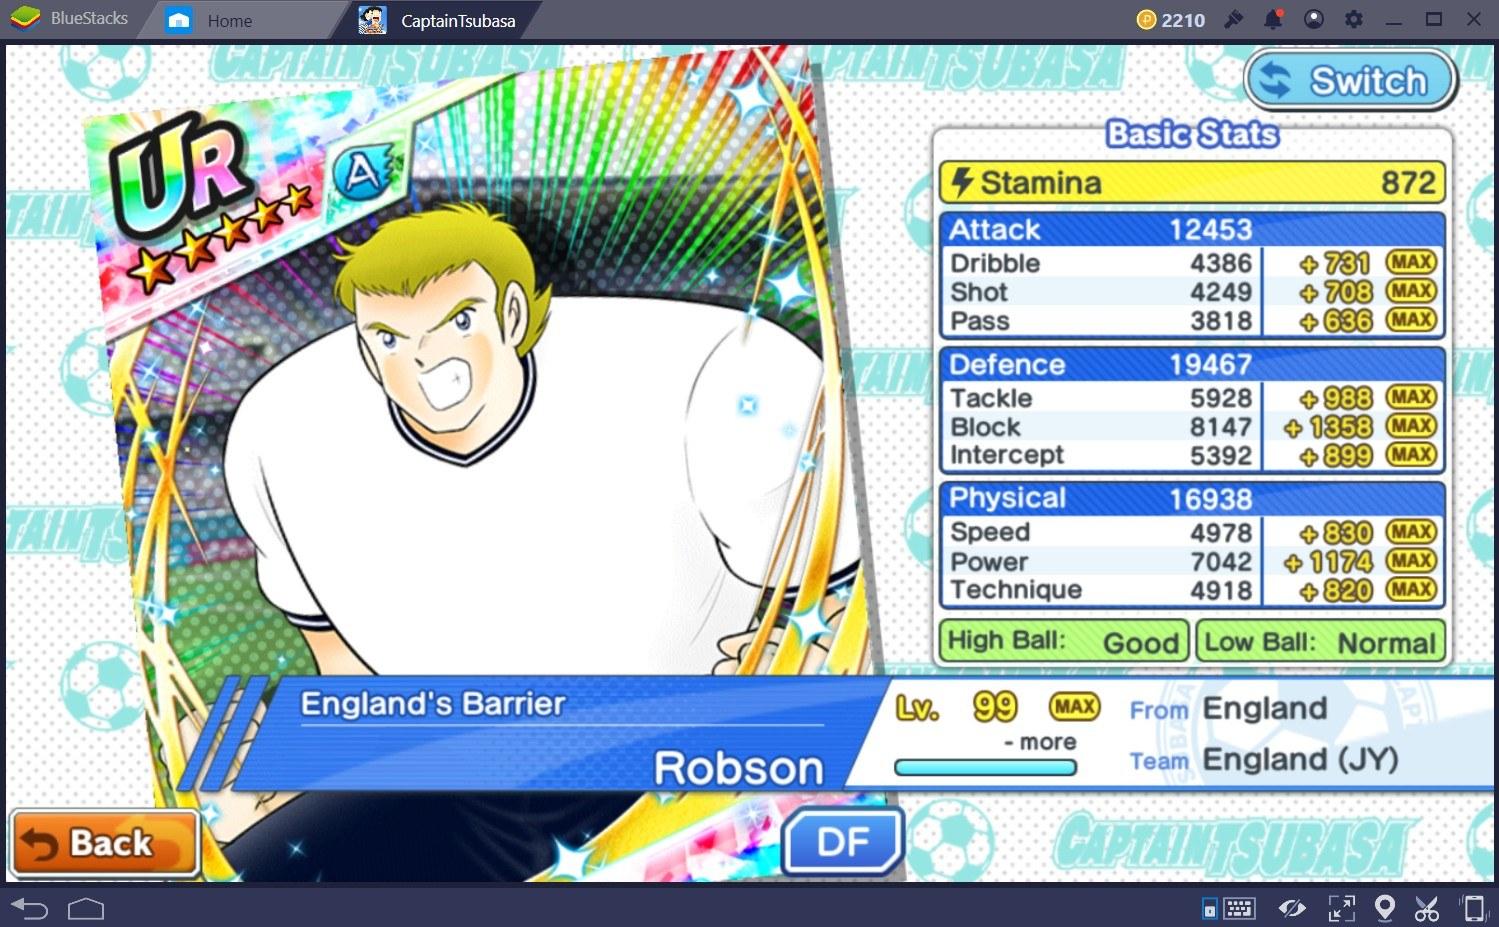 Captain Tsubasa: Dream Team – Những huyền thoại World Cup 'ẩn mình' trong game (Kỳ 1)